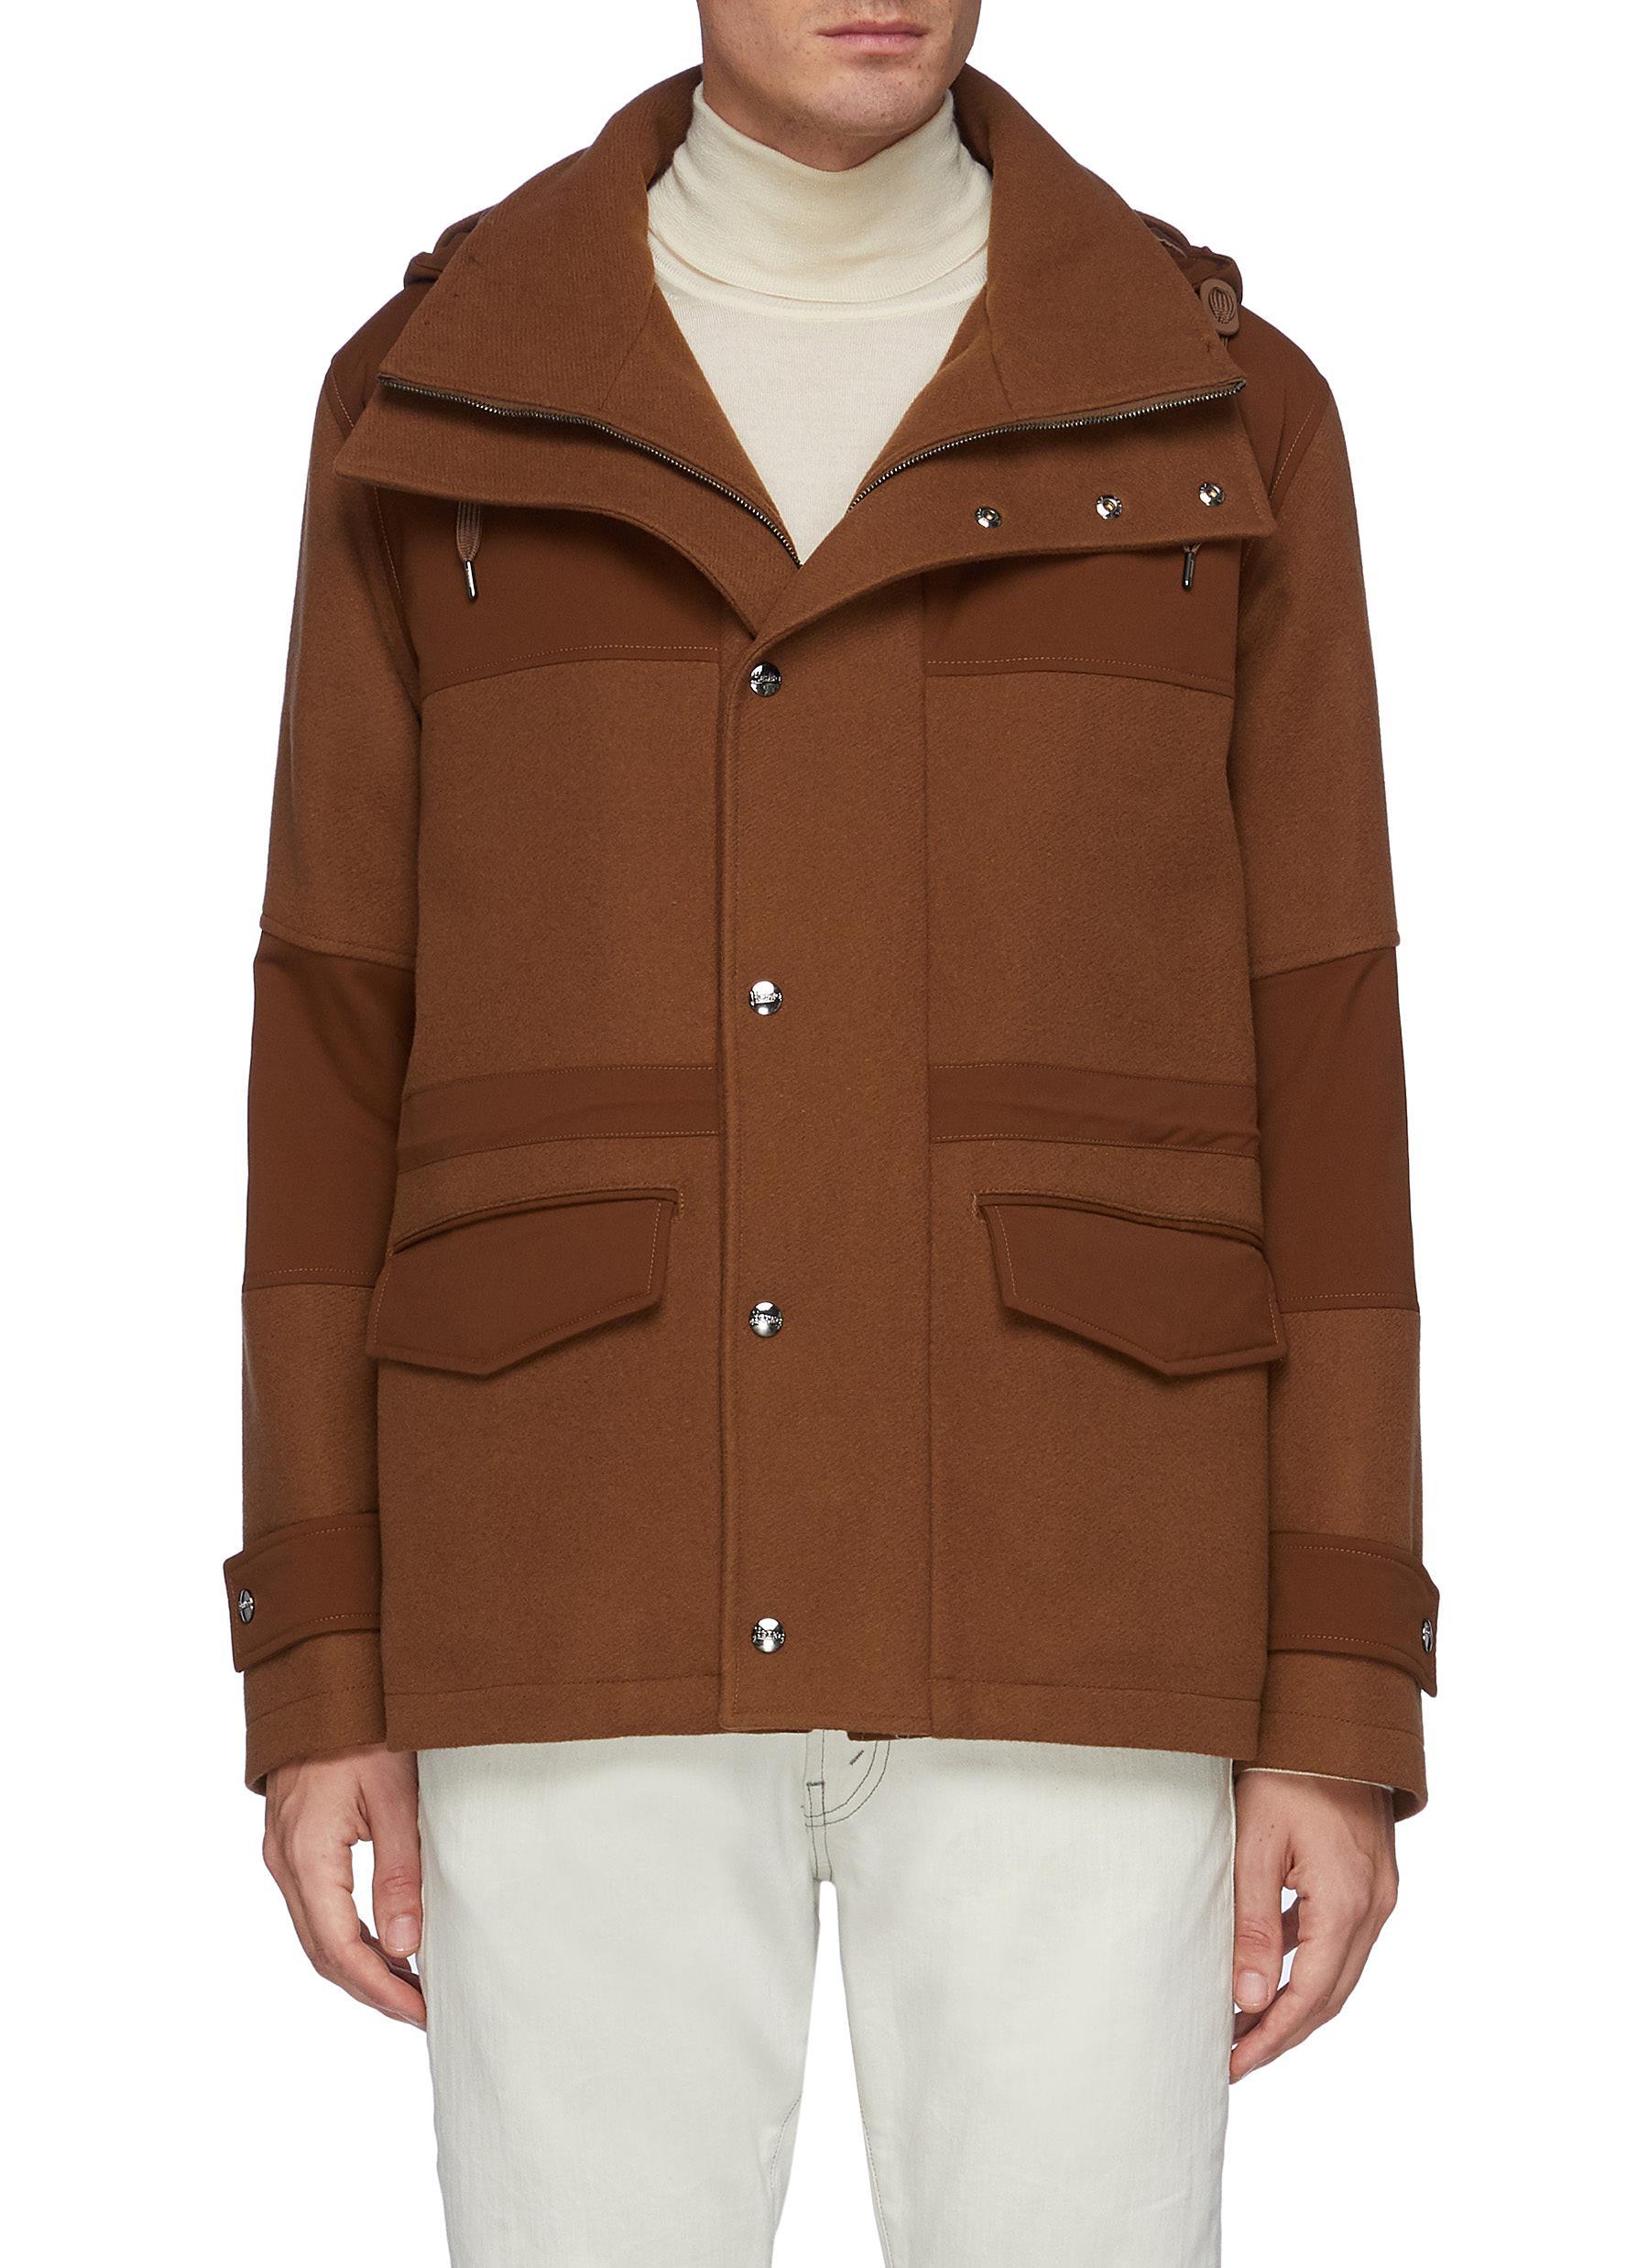 Detachable Hood Herno-Tech Jacket - HERNO - Modalova